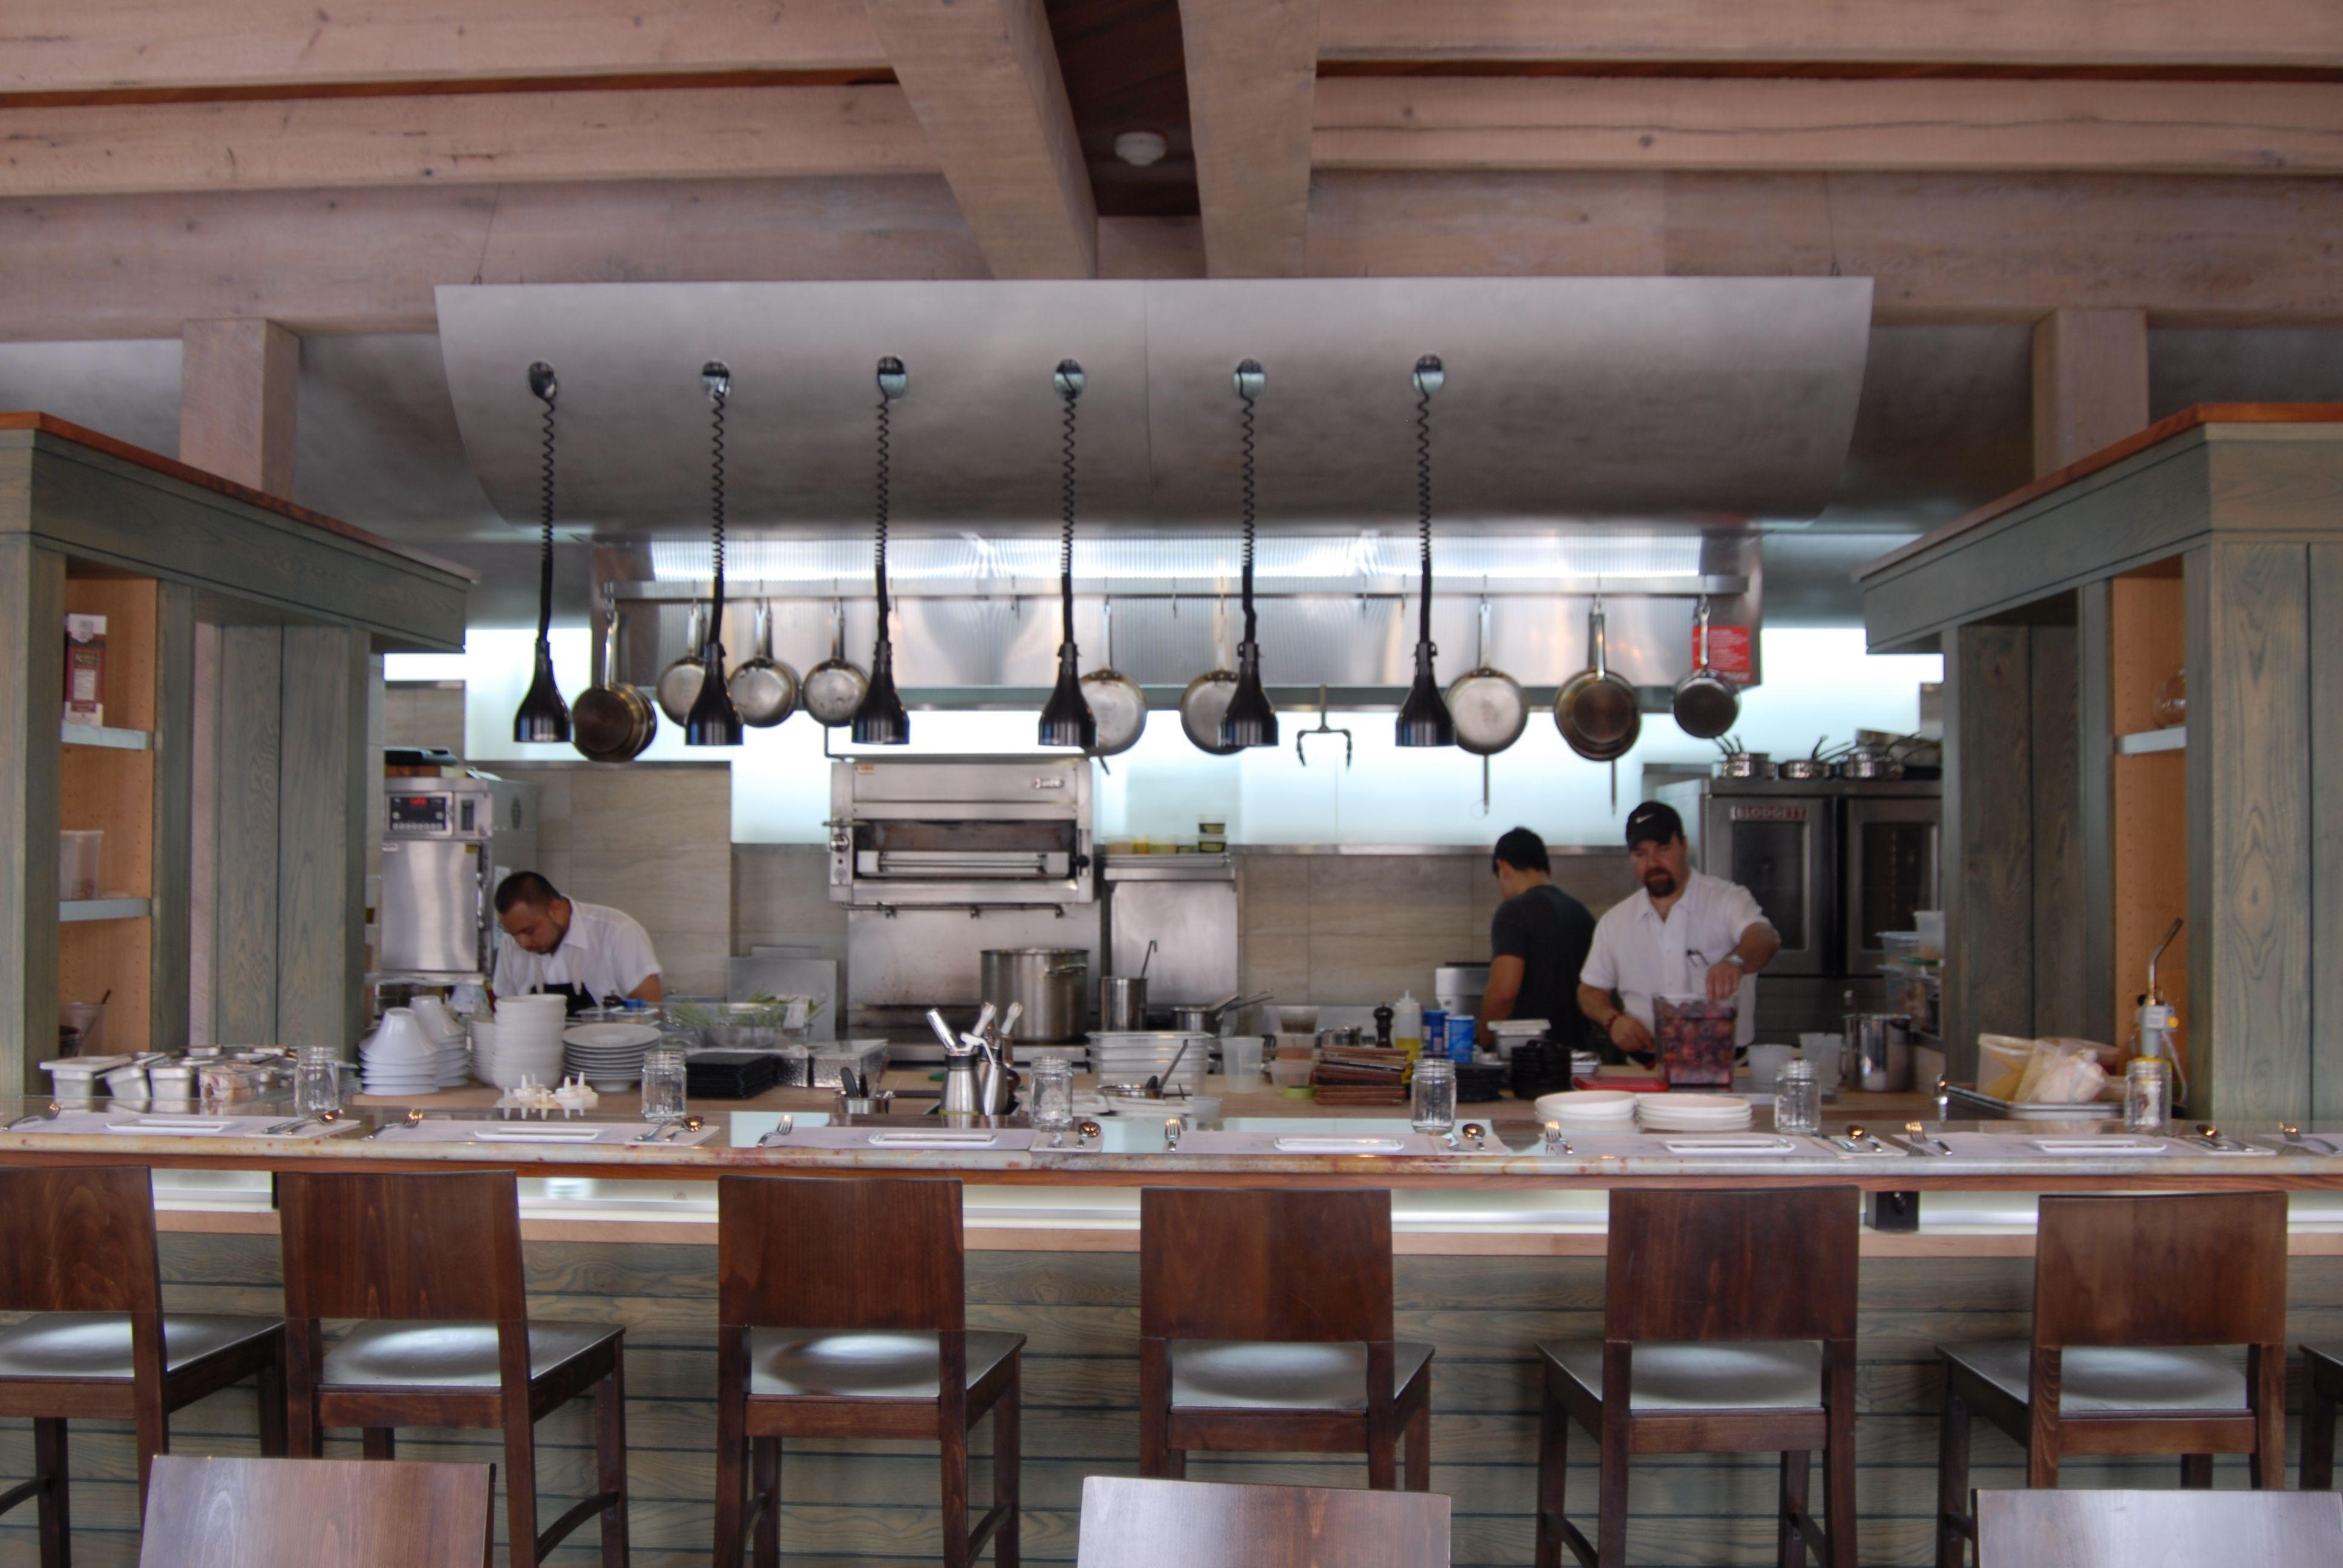 Restaurant Kitchen Design Brizo Faucet Open Google Search 43 Dining